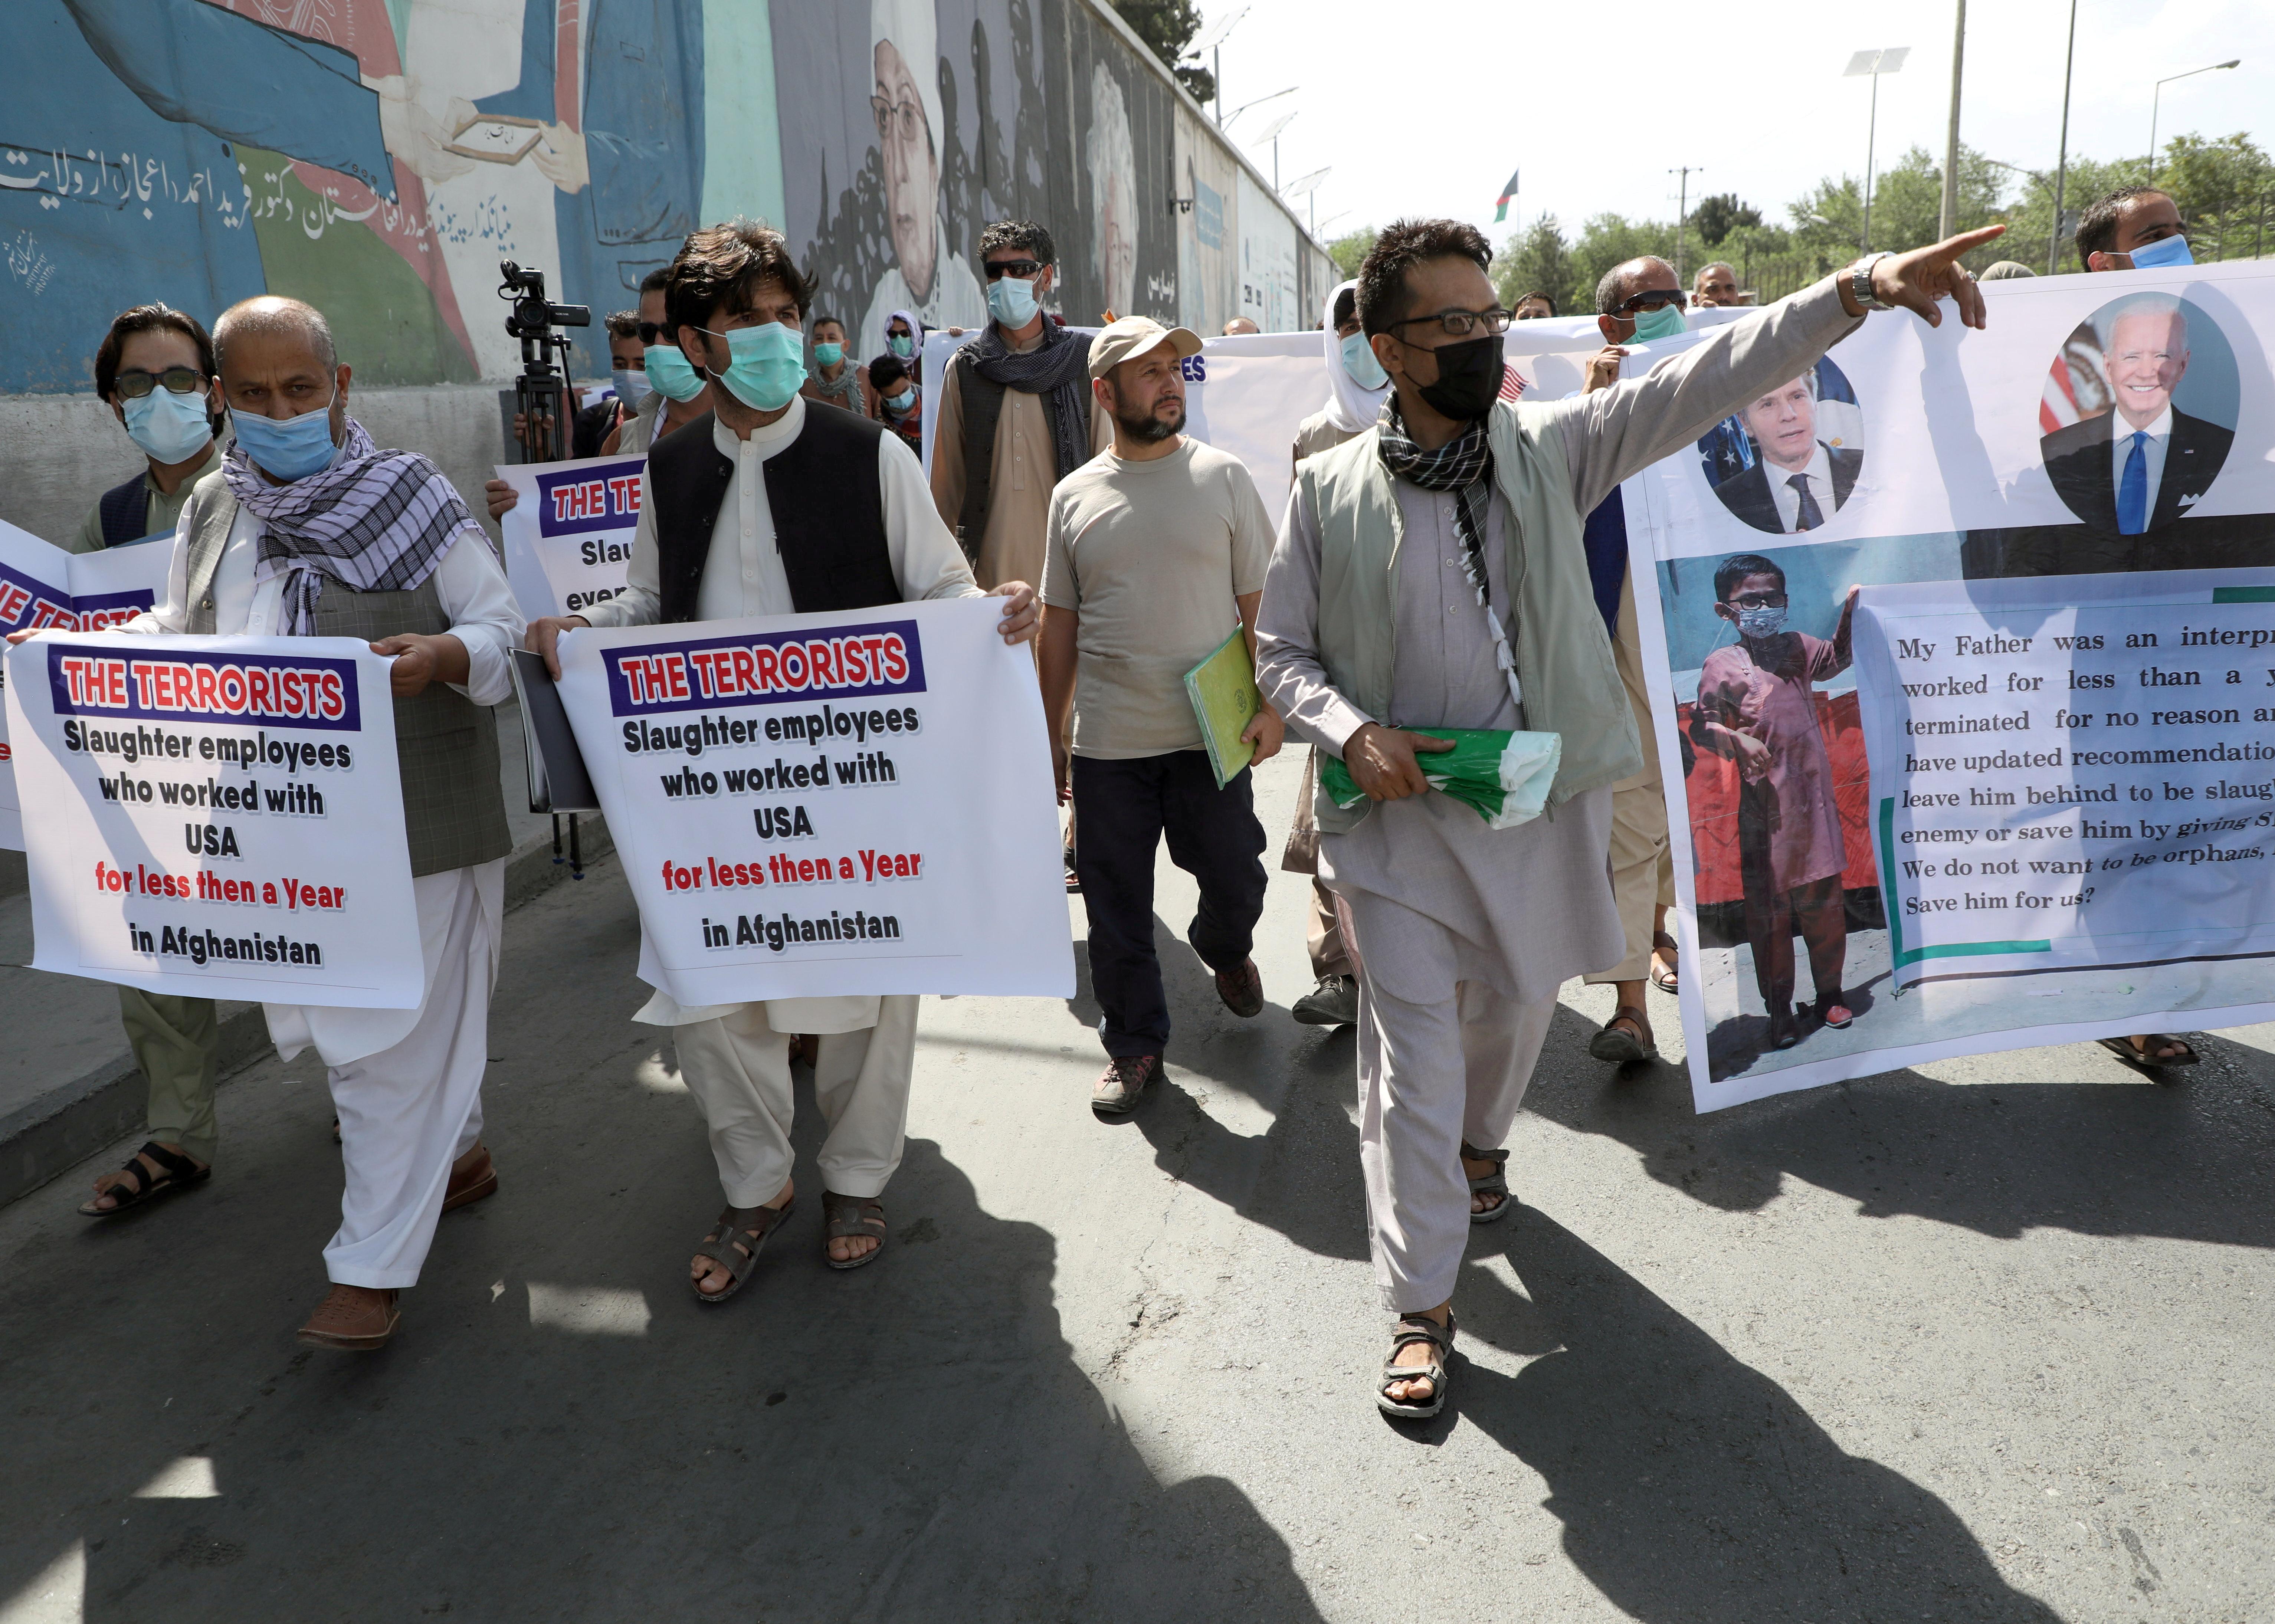 Former Afghan interpreters, who worked with U.S. troops in Afghanistan, demonstrate in front of the U.S. embassy in Kabul June 25, 2021. REUTERS/Stringer/File Photo